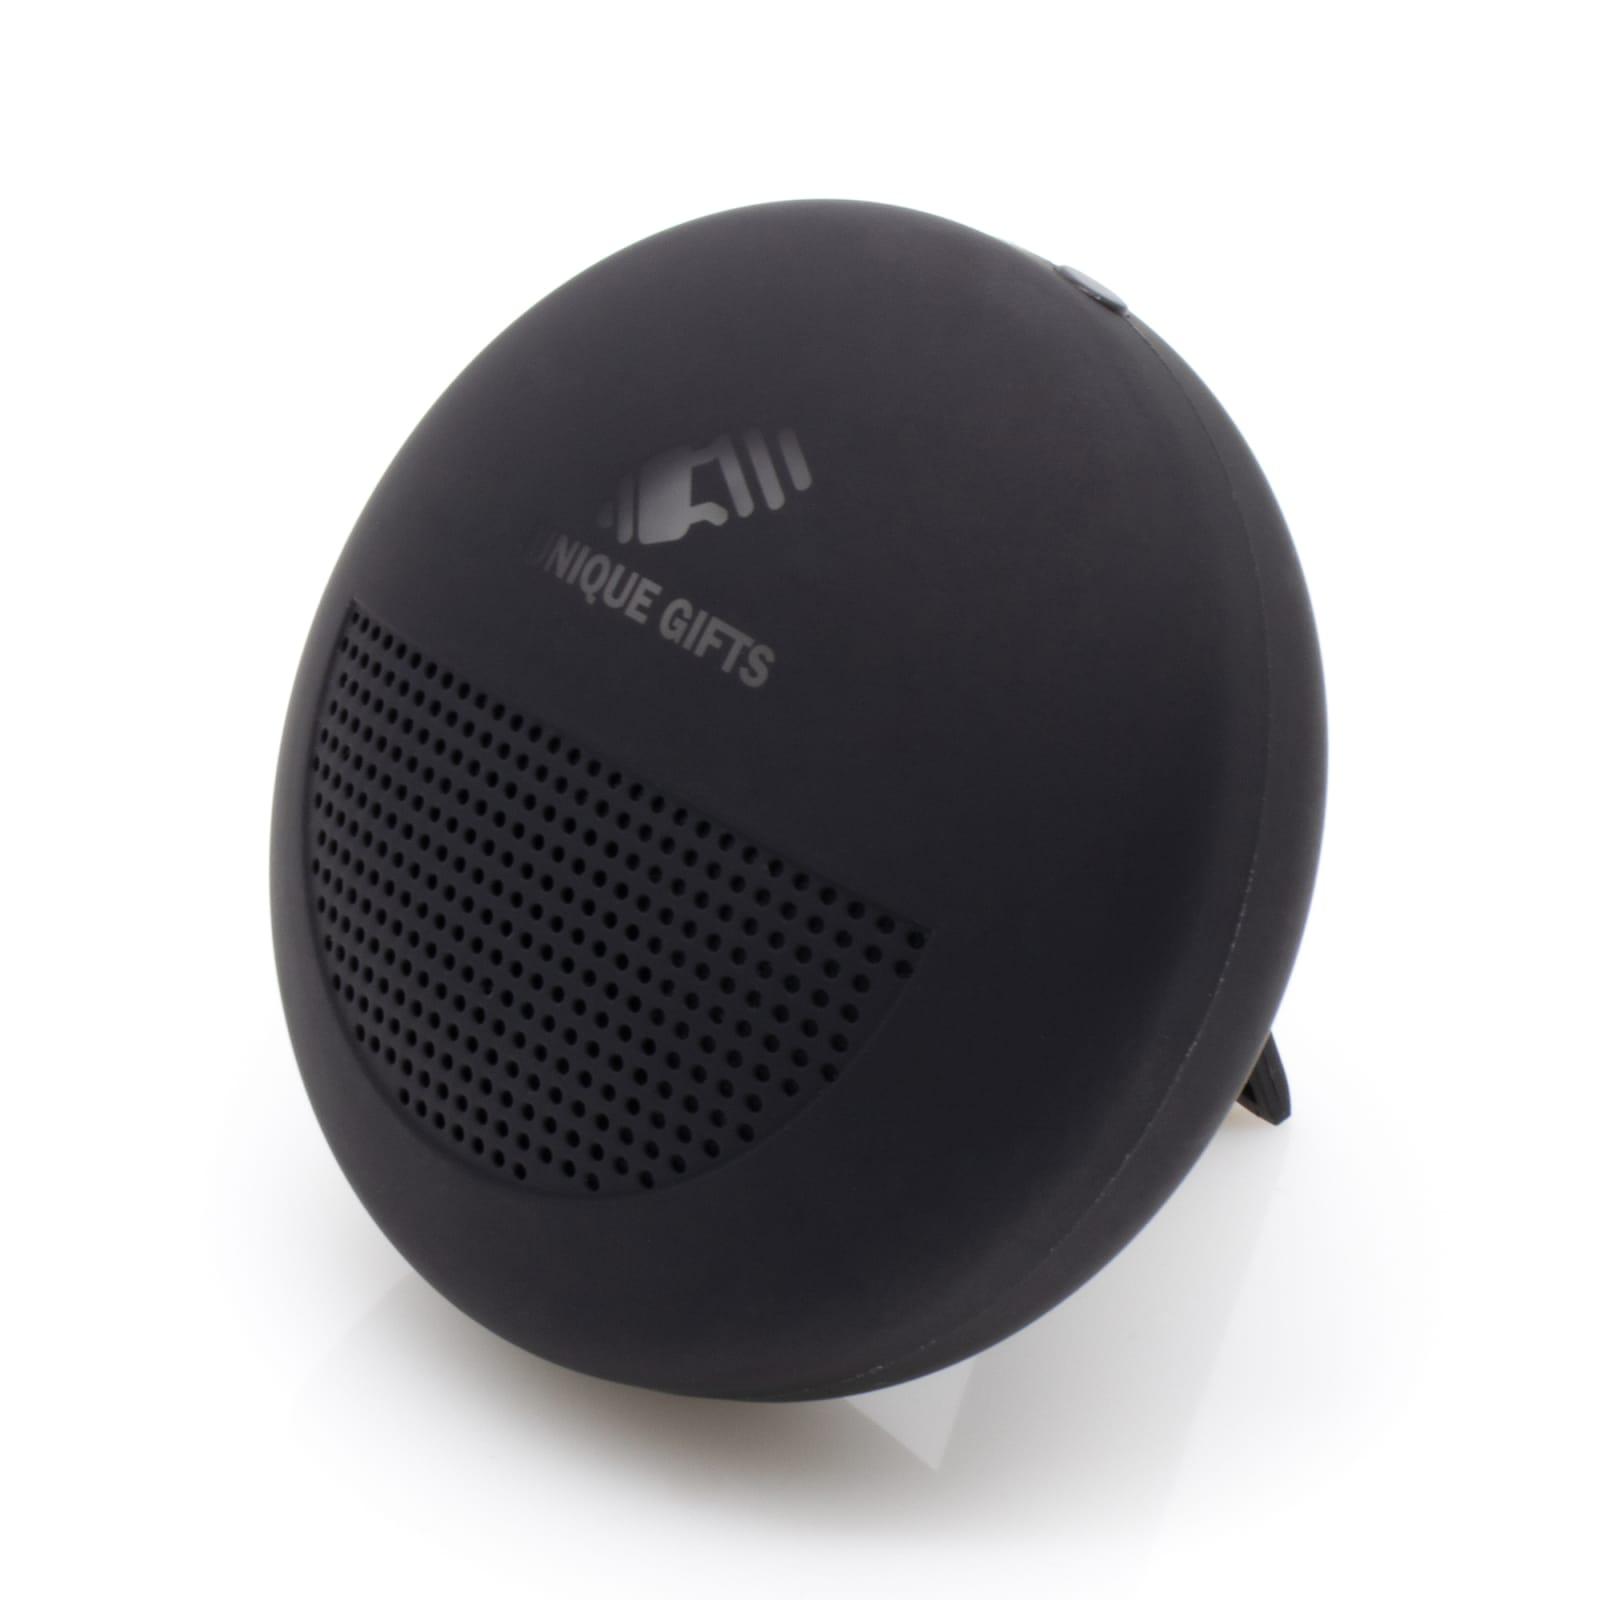 Lautsprecher  - Lautsprecher Spotlight Großansicht